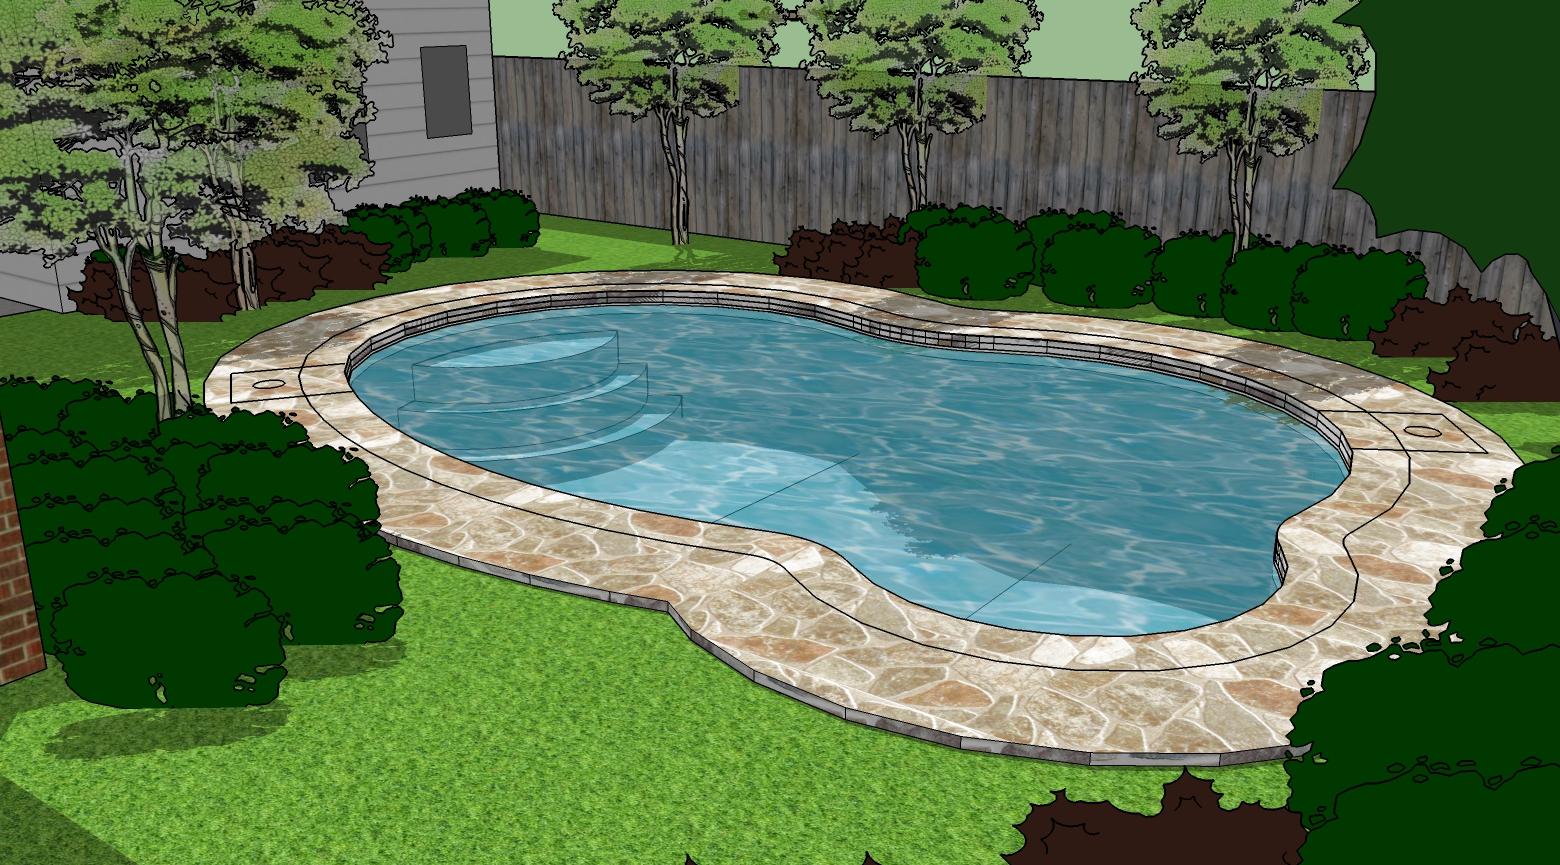 Affordable Inground Swimming Pools | Mystic Pools | Hammond, Louisiana